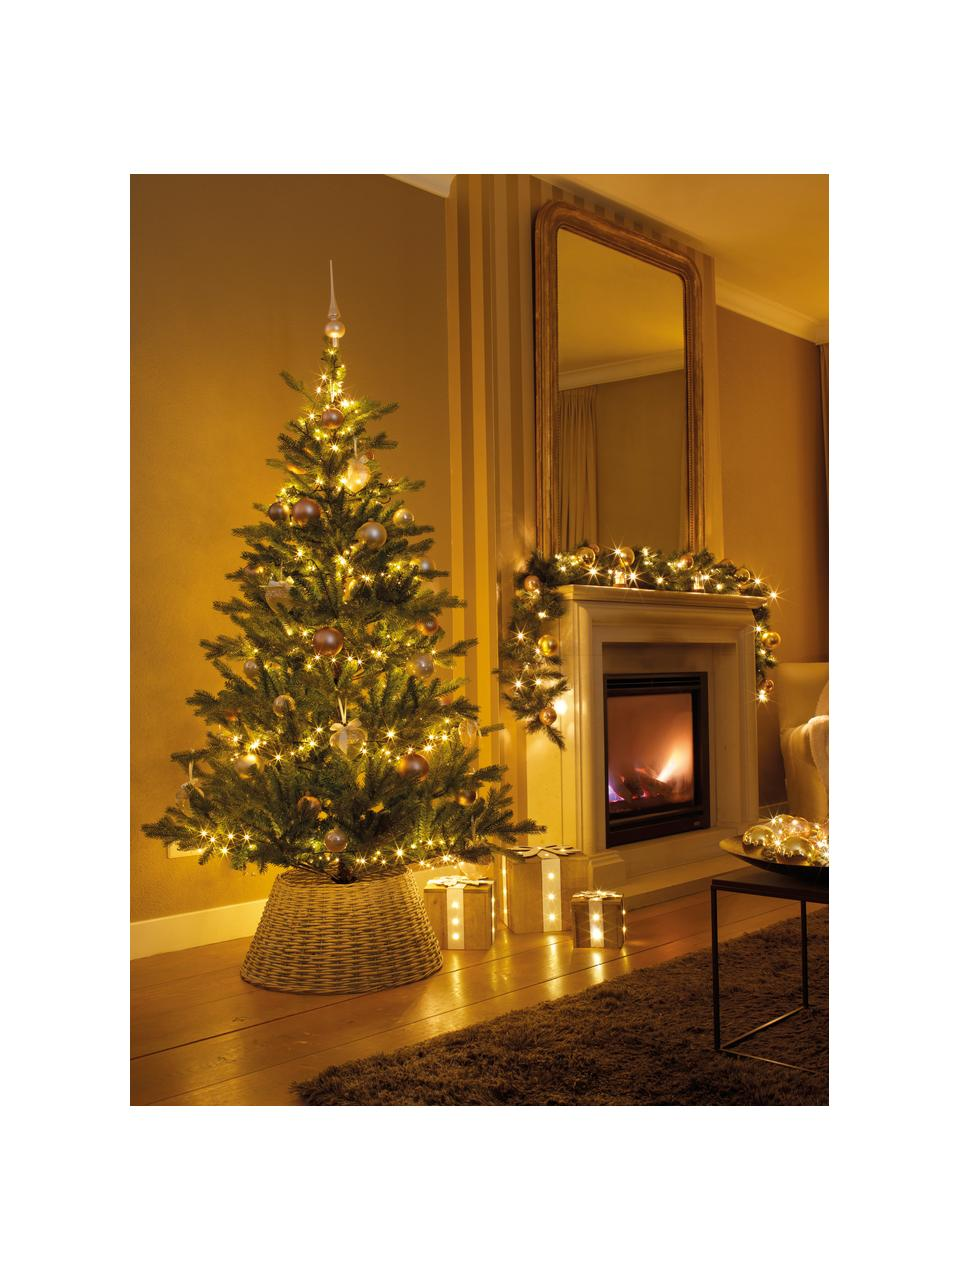 Dimmbare LED-Lichterkette 1-2 Glow, warmweiß, Kunststoff, Dunkelgrün, H 150 cm